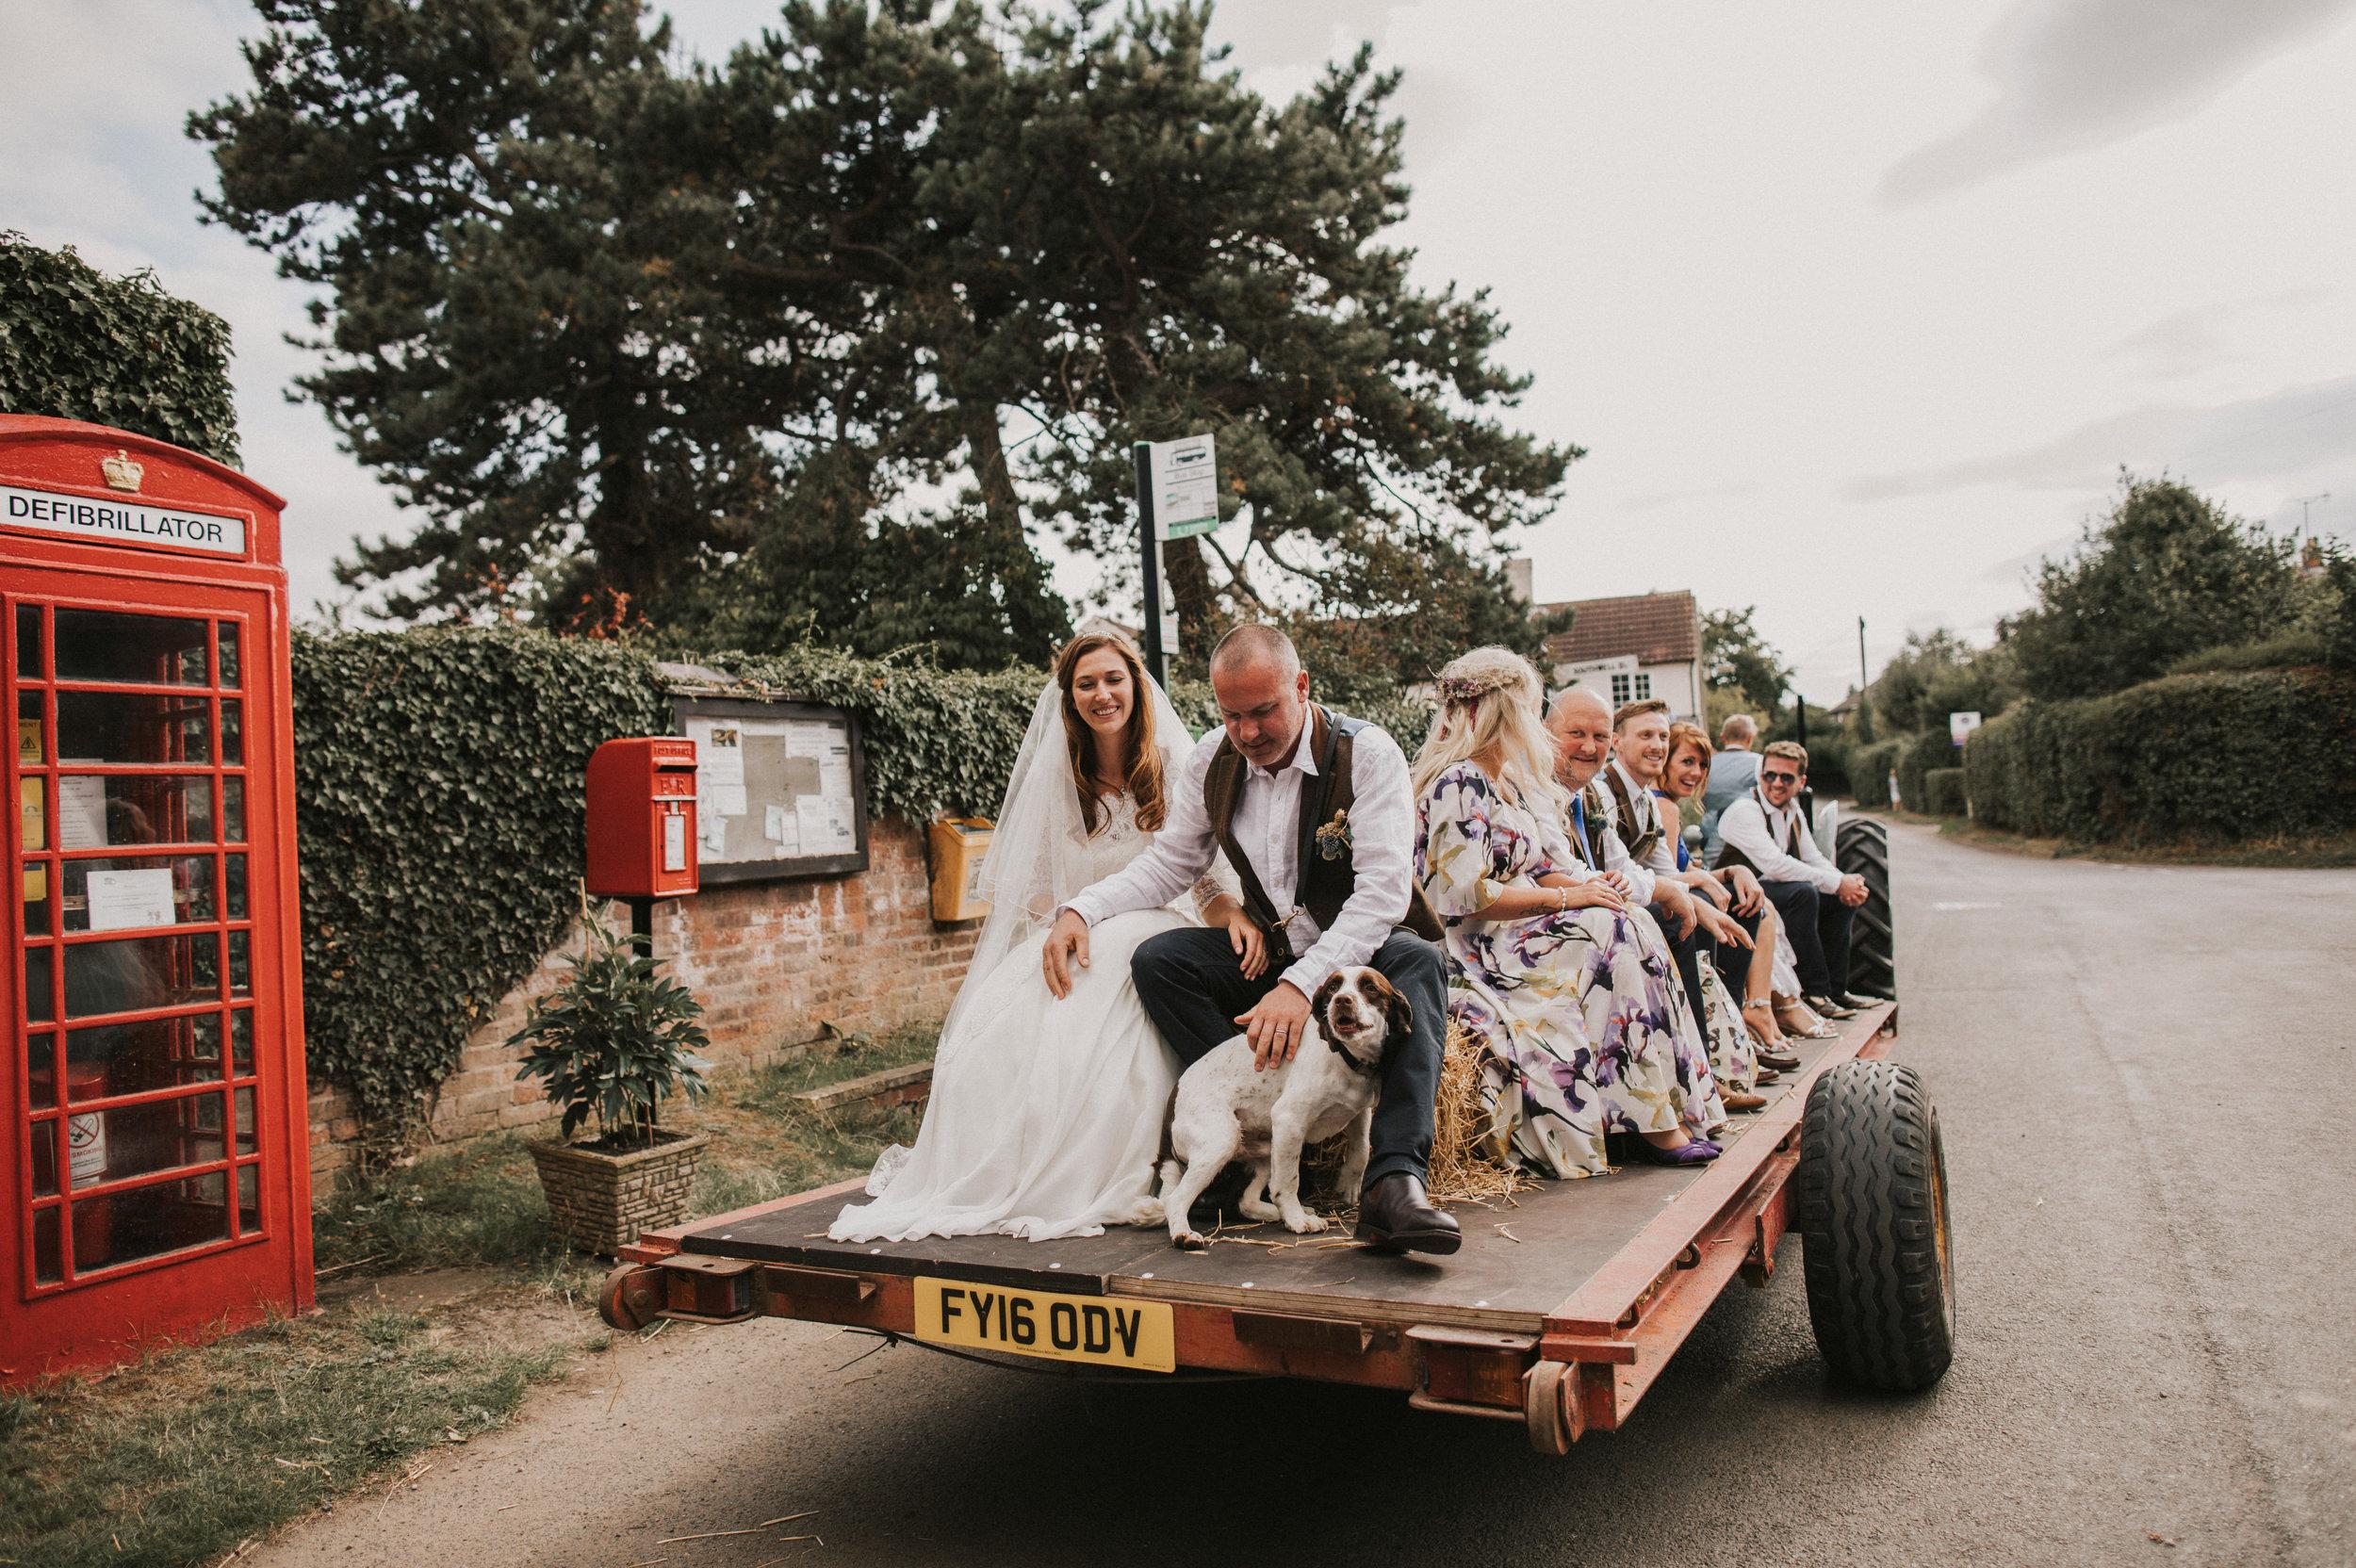 brook rose photography  Farm wedding_187.jpg